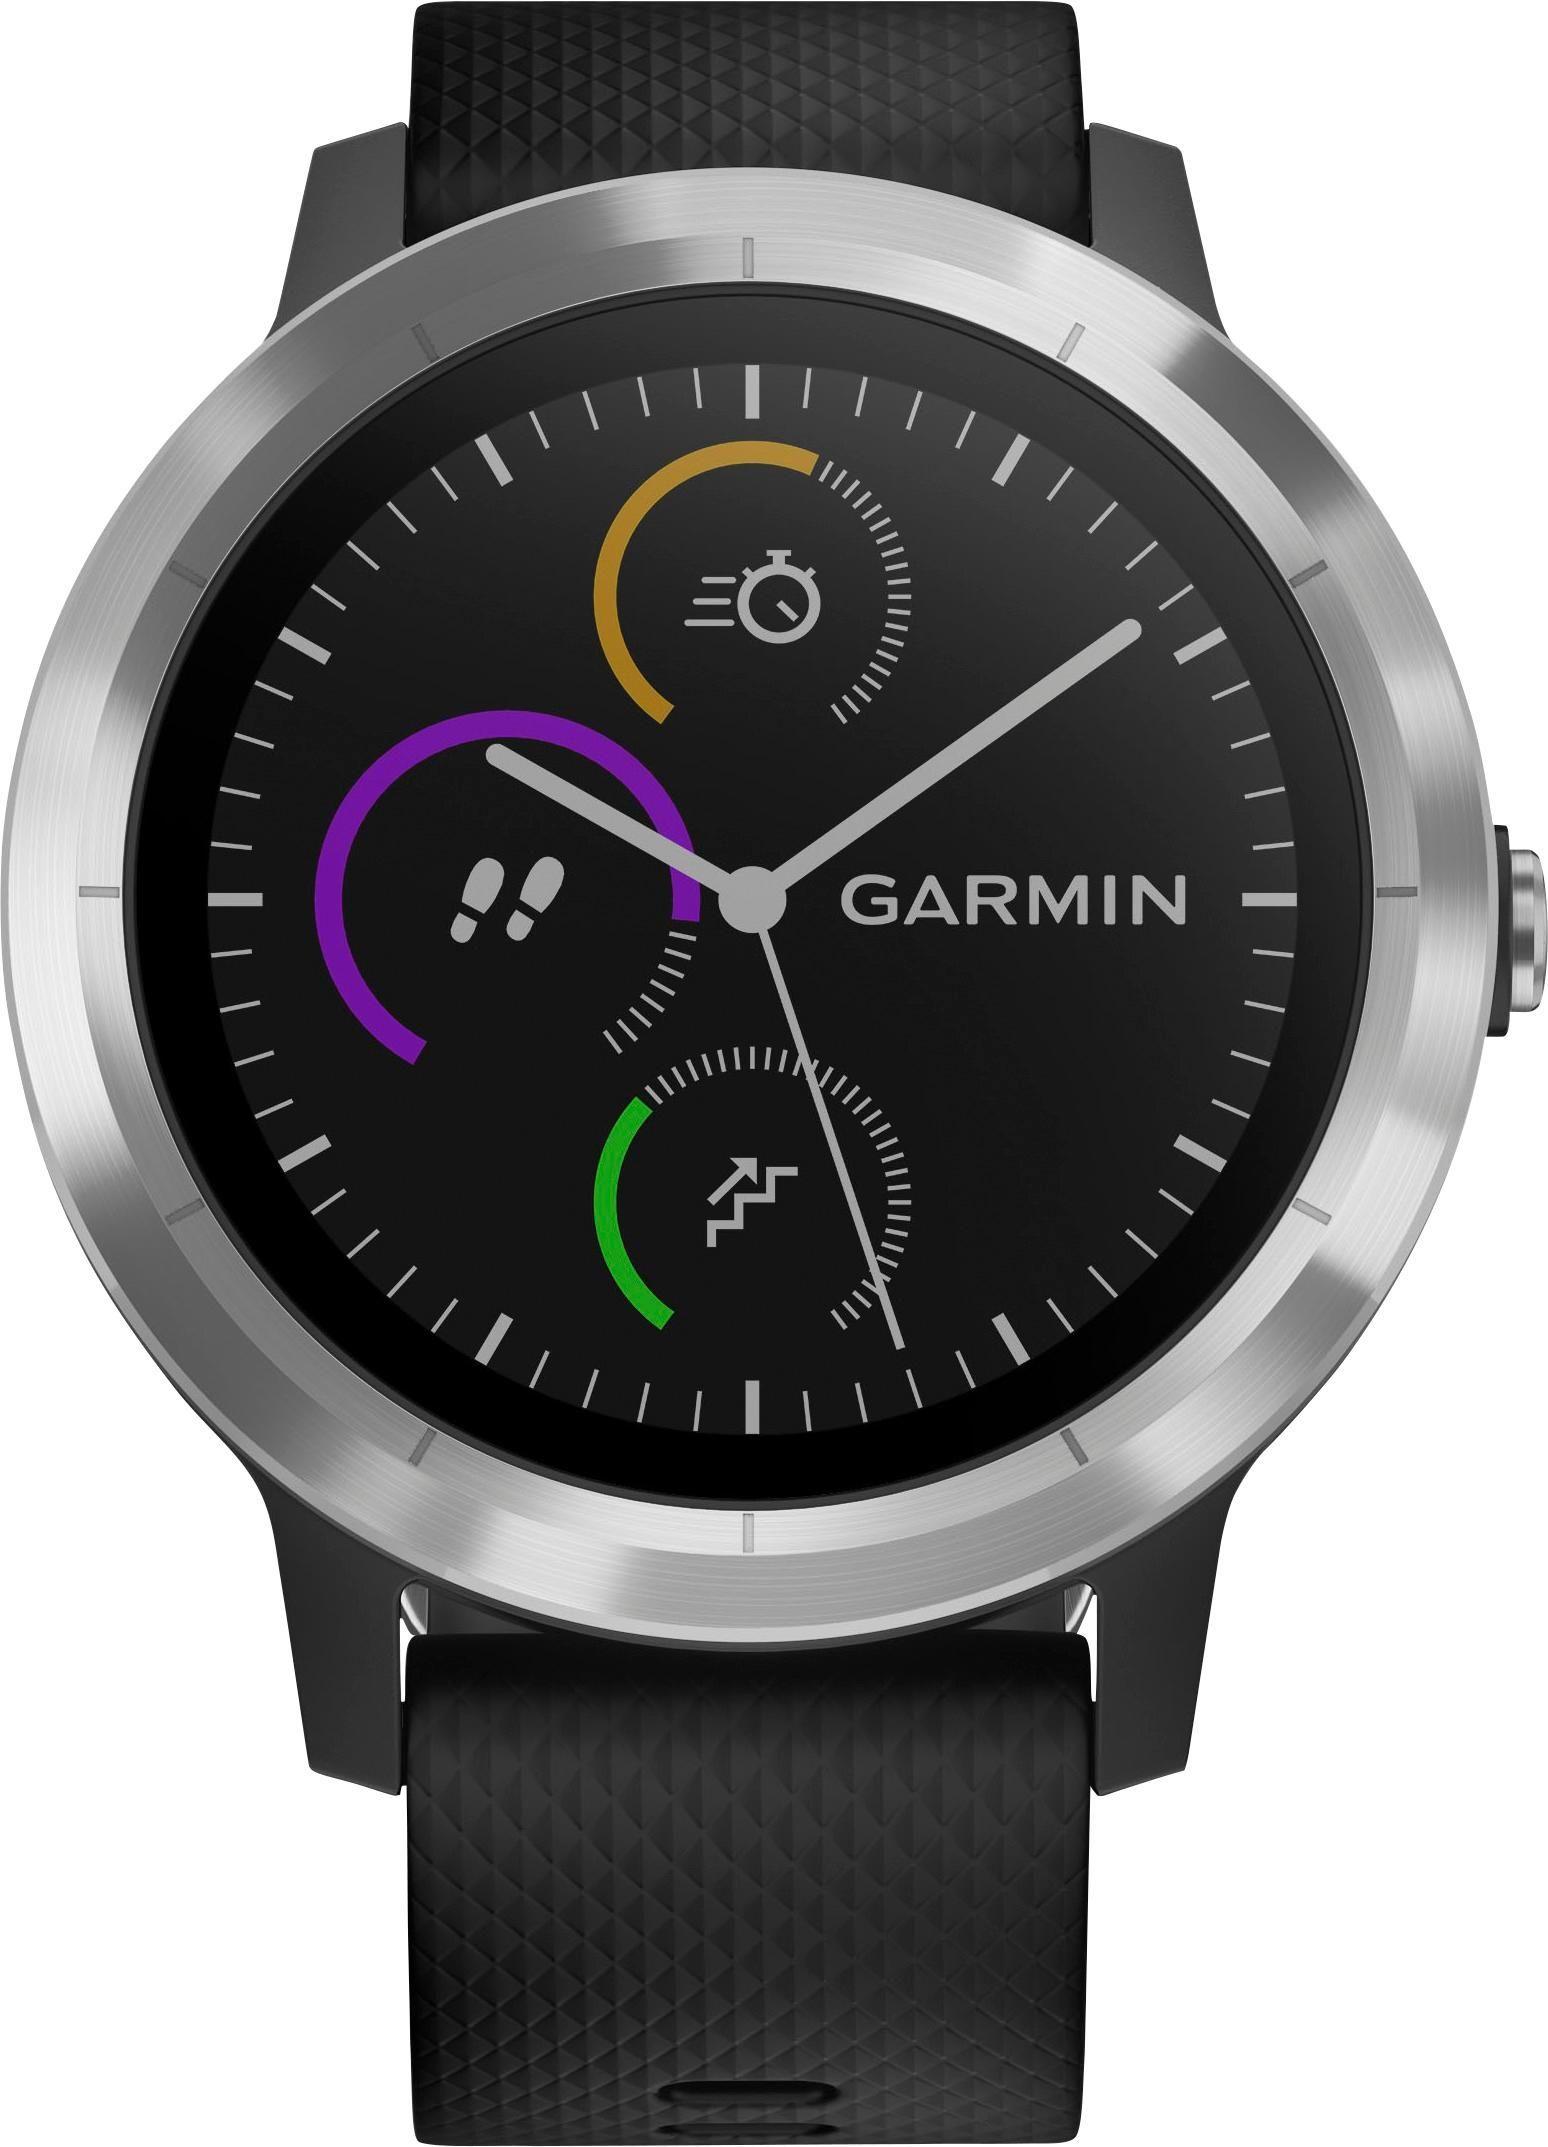 Garmin Vivoactive 3 GPS Smartwatch - £129.99. Amazon Prime Exclusive